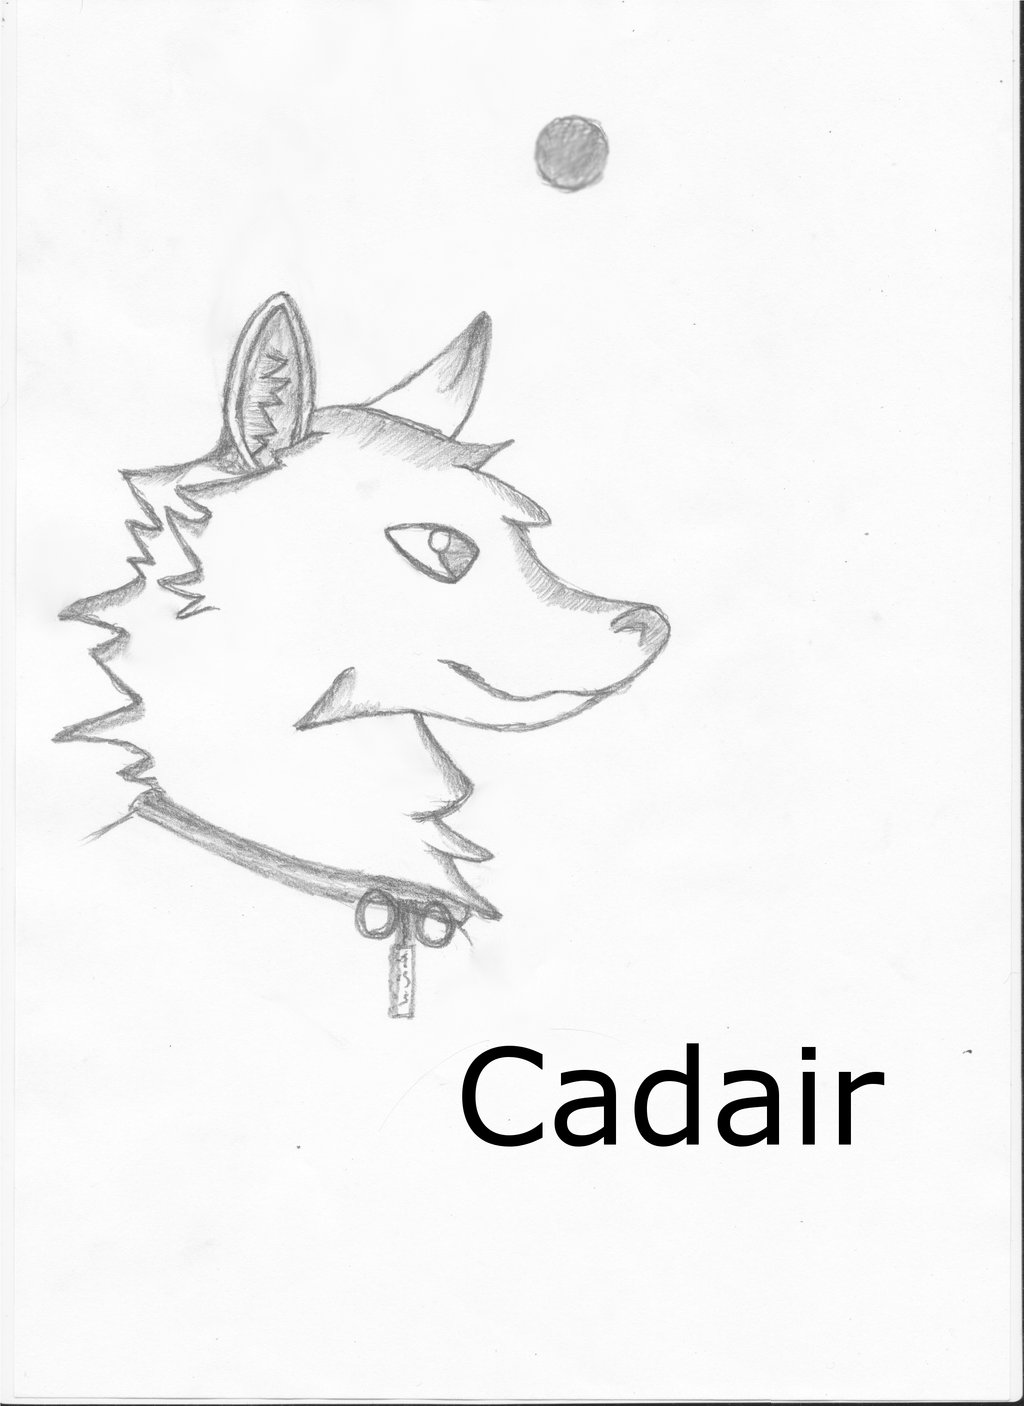 cadair's Profile Picture